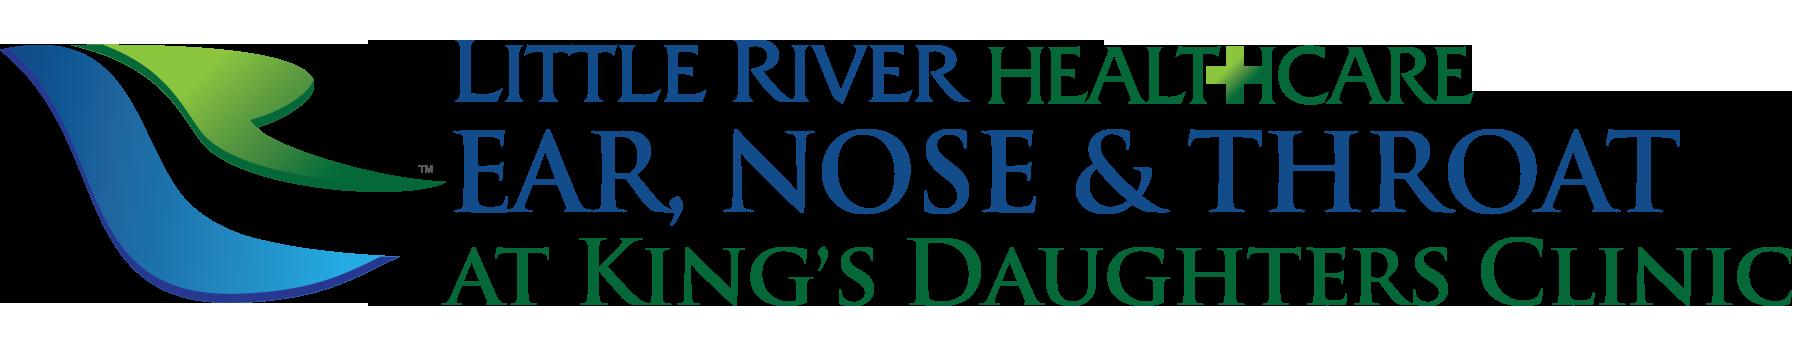 Ear nose throat doctors. Ears clipart ent